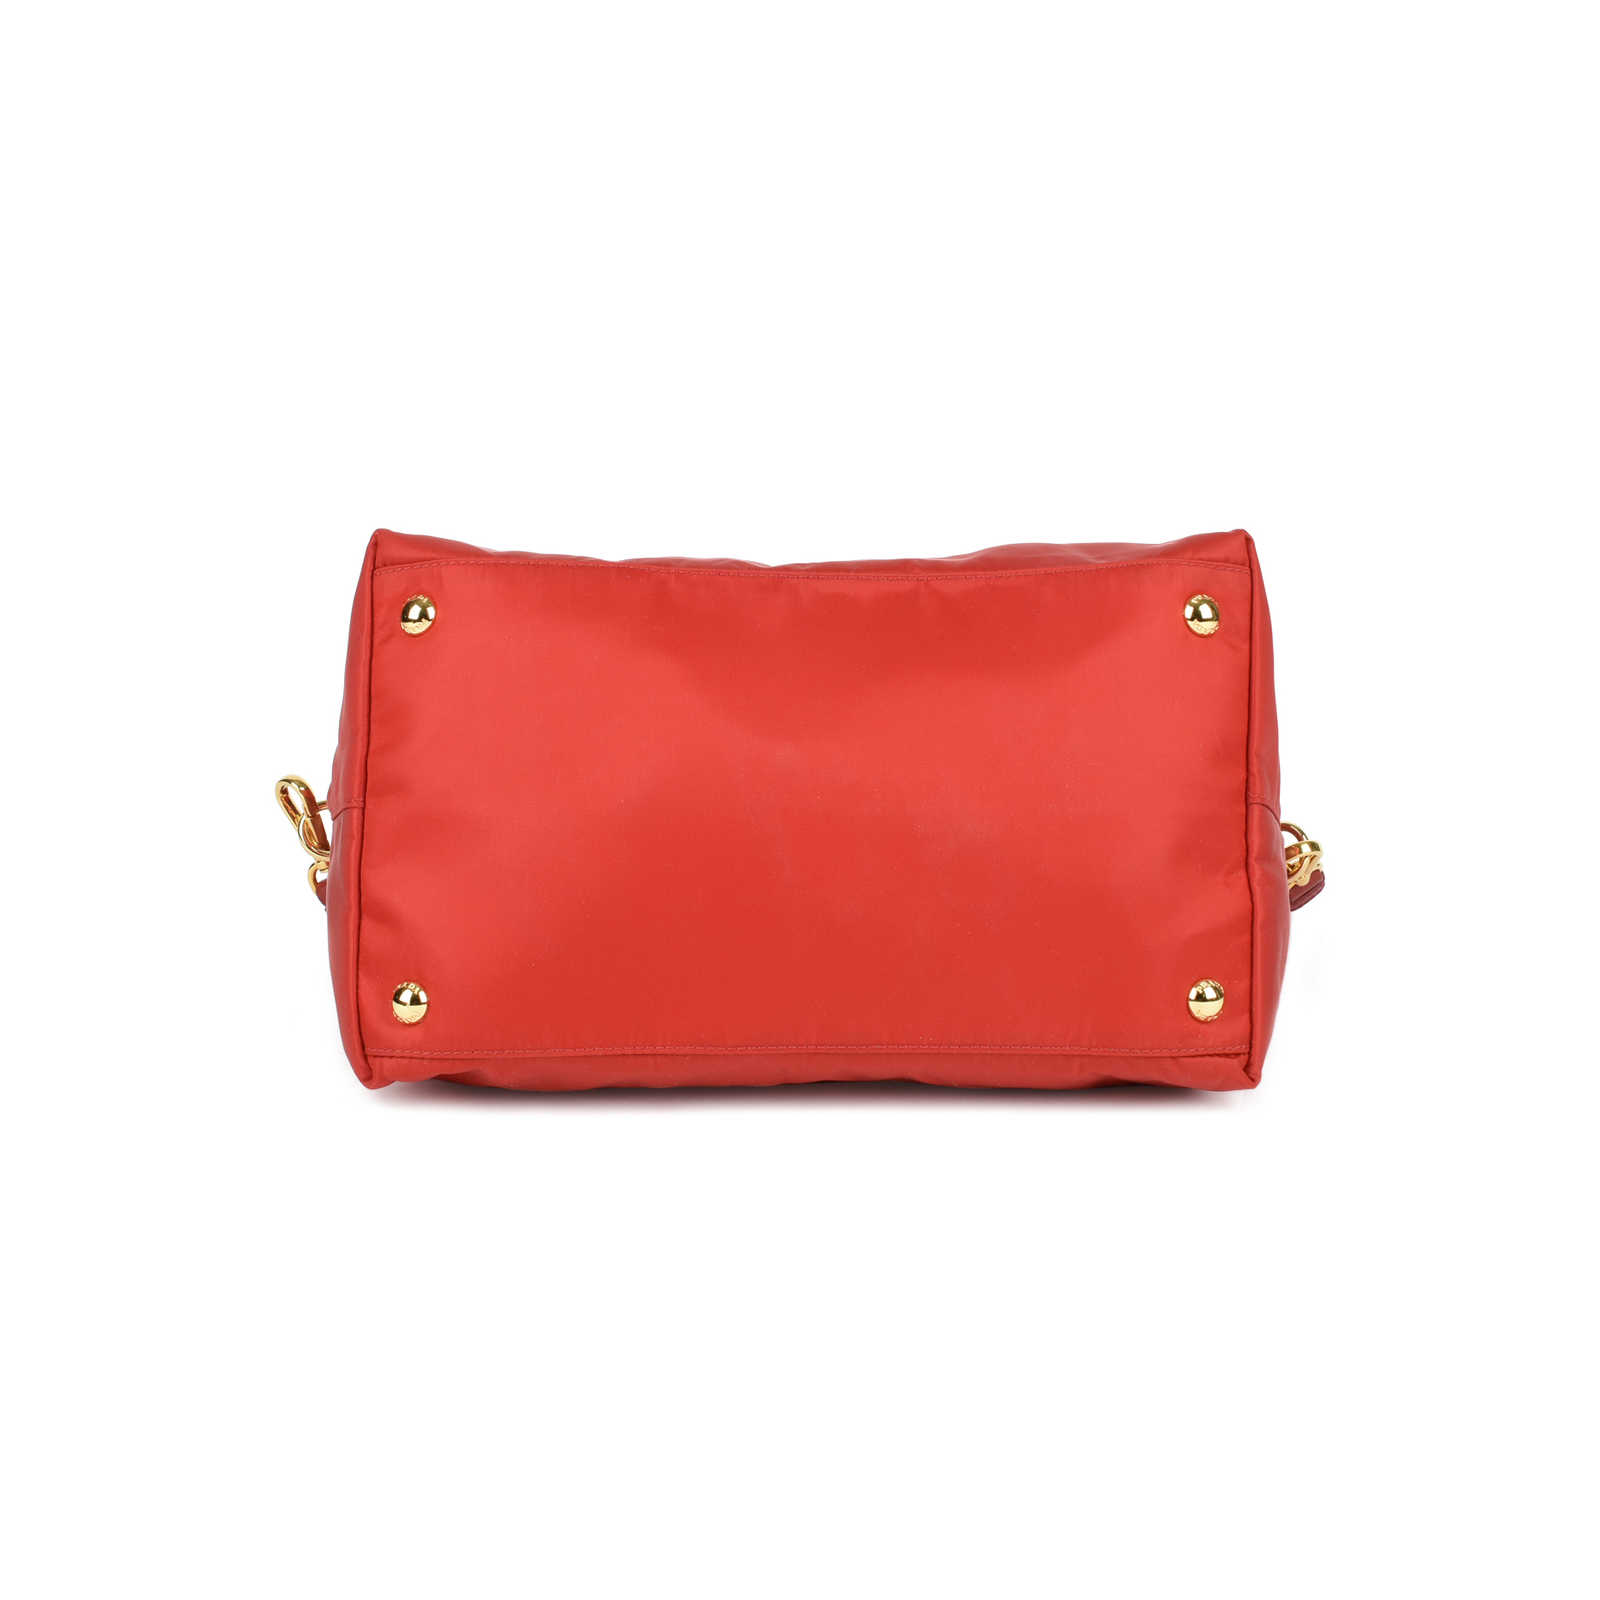 e12c5a87aa ... Authentic Second Hand Prada Tessuto Saffiano Tote Bag (PSS-446-00004)  ...